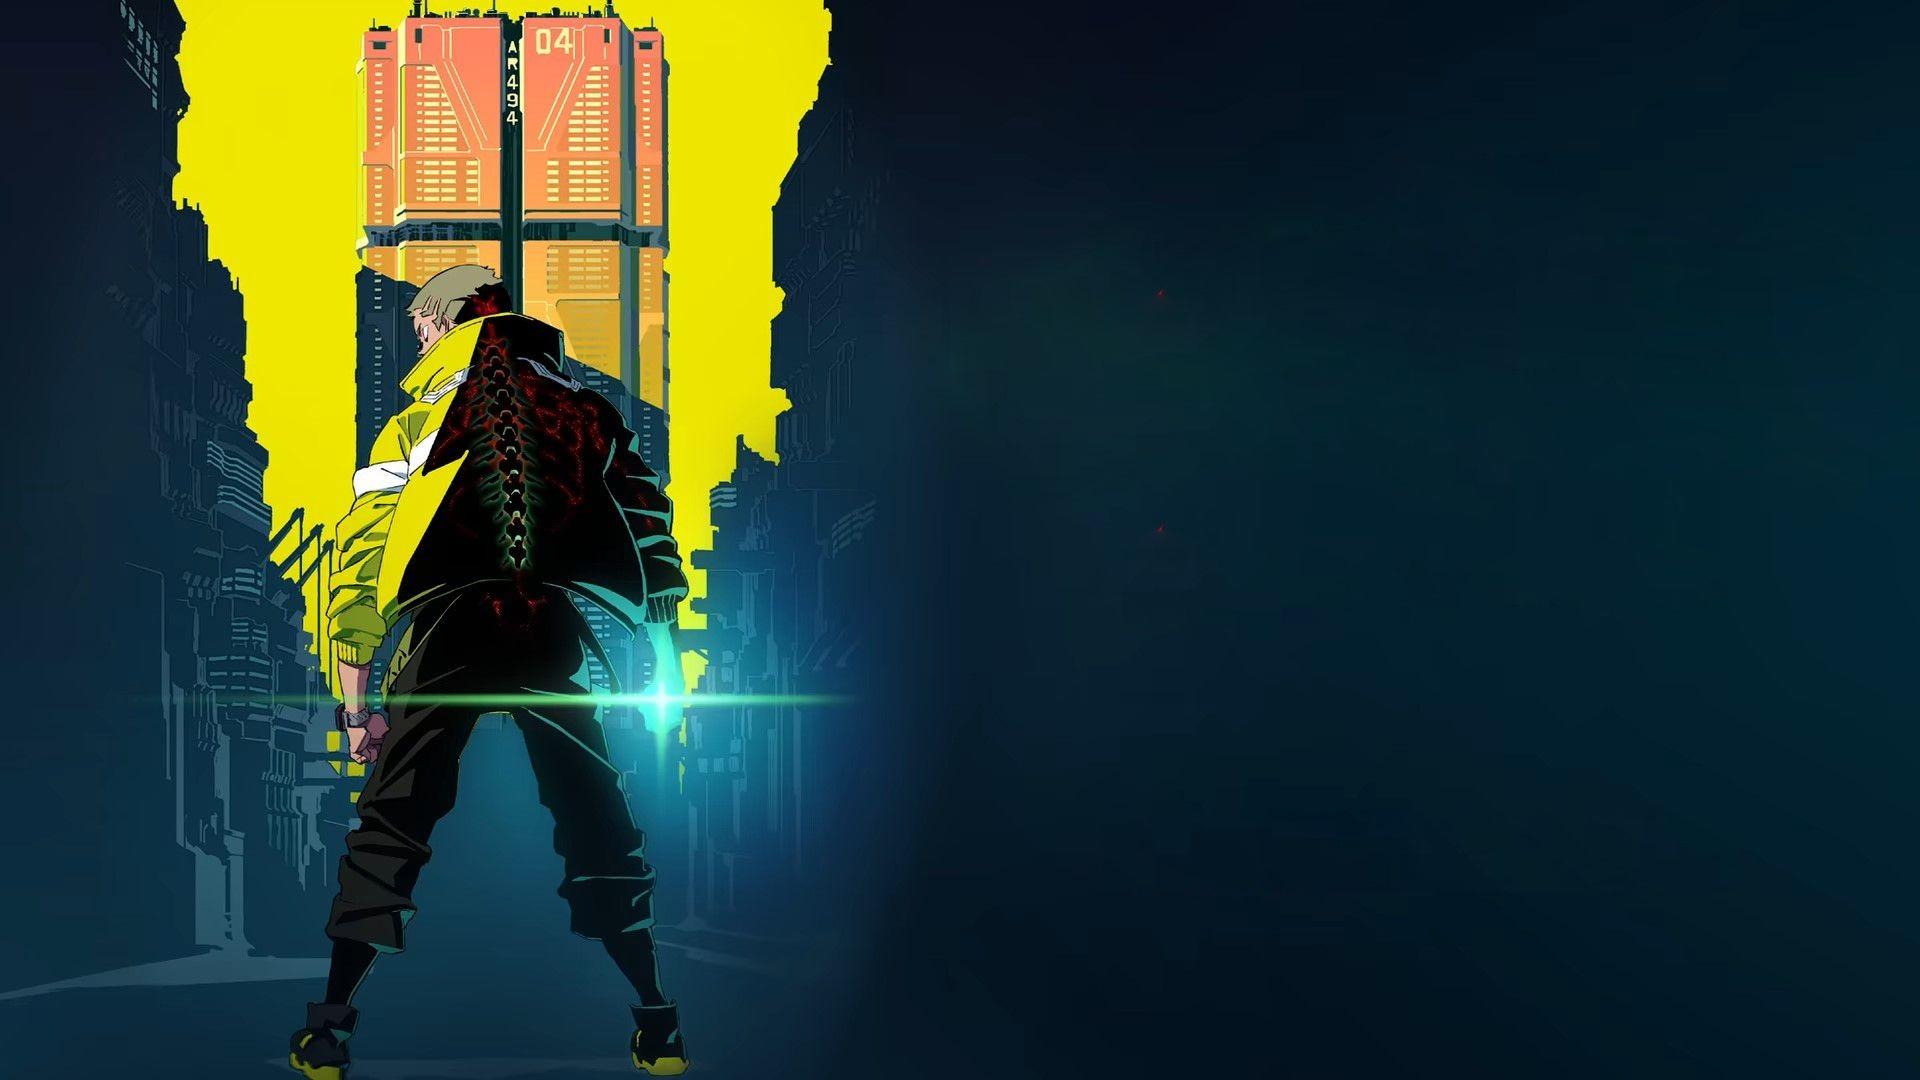 Cyberpunk 2077 Poster Image